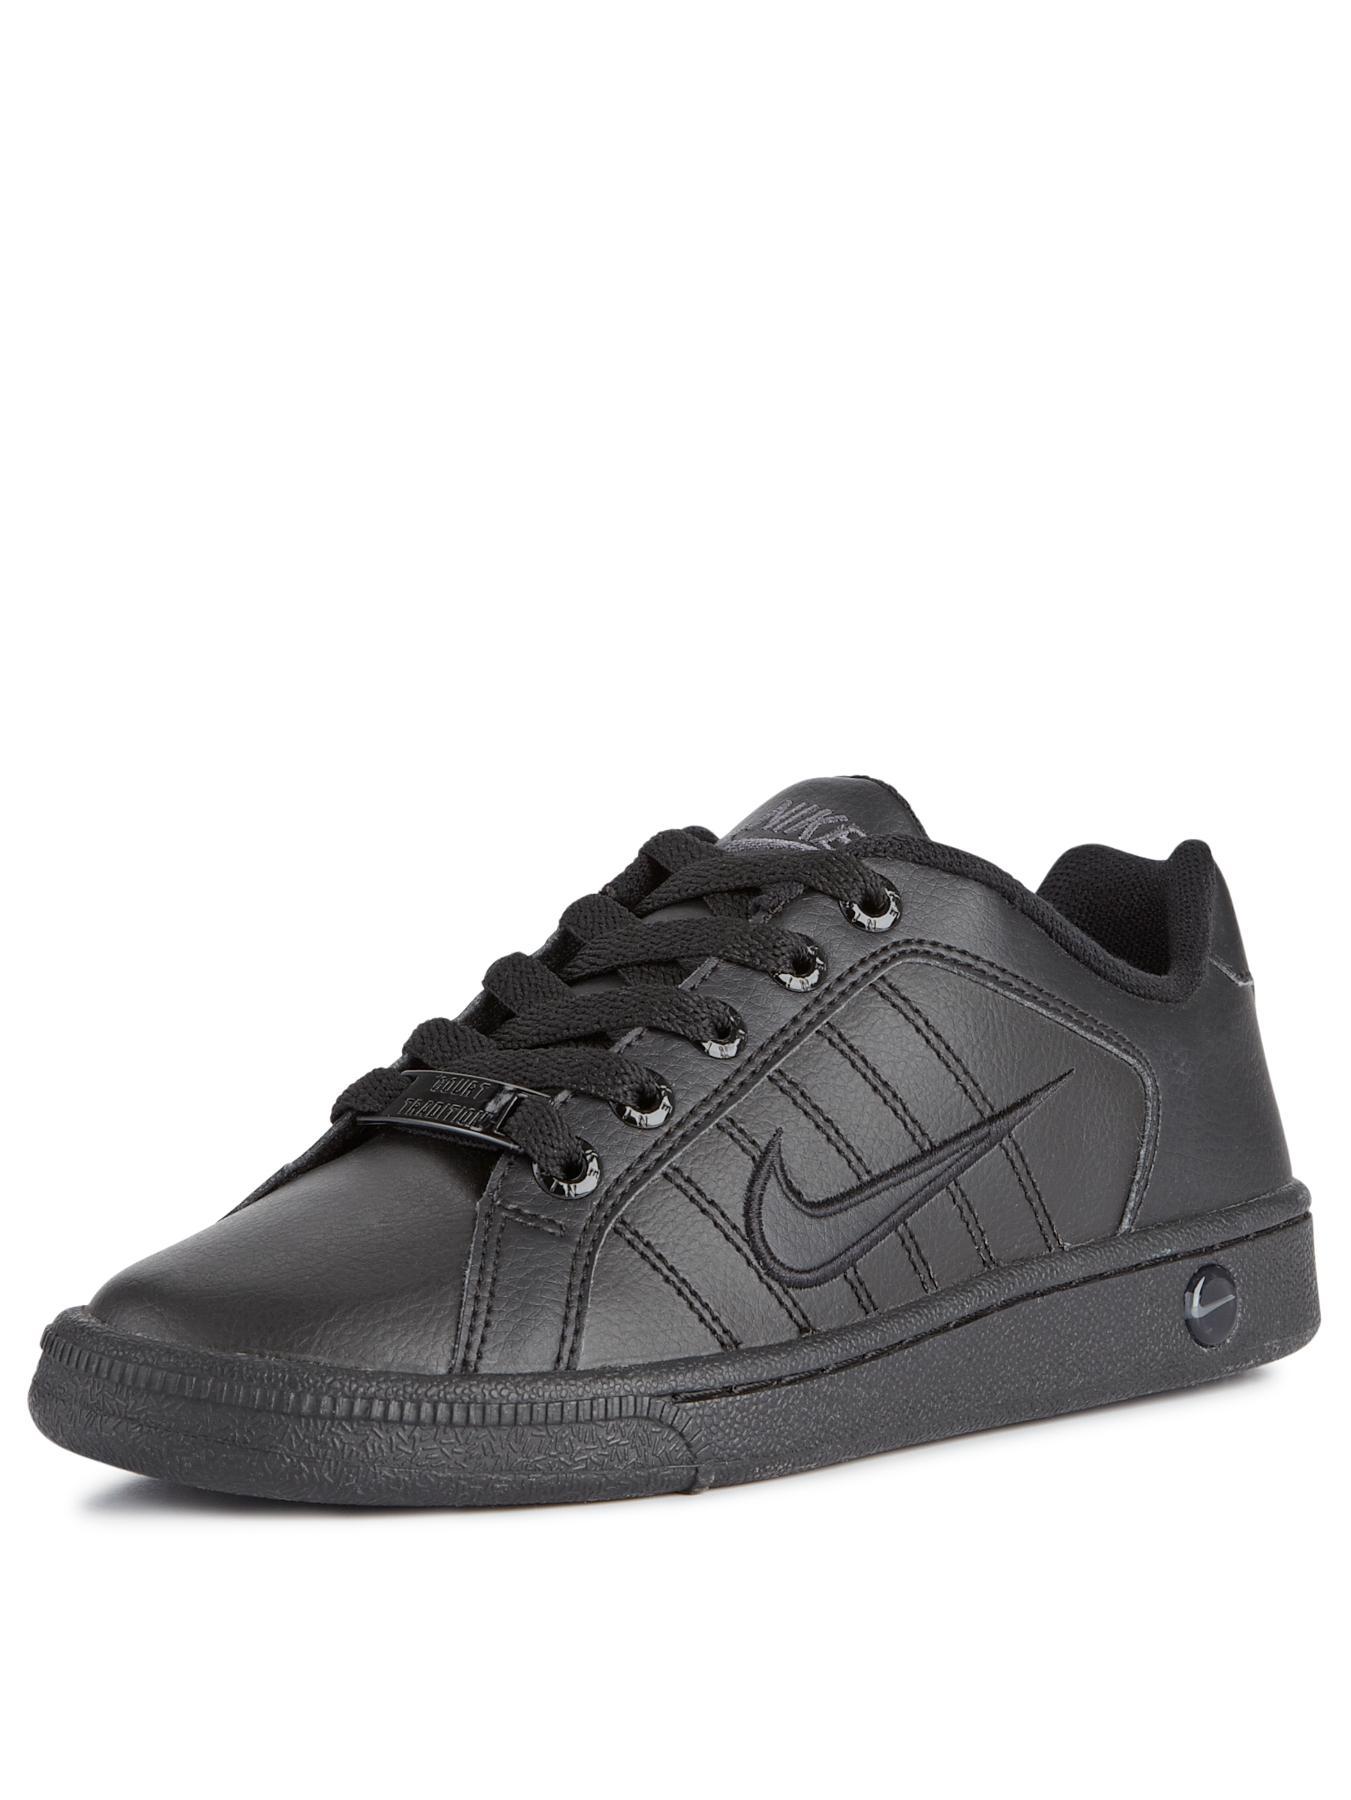 nike school shoes nike black school shoes price